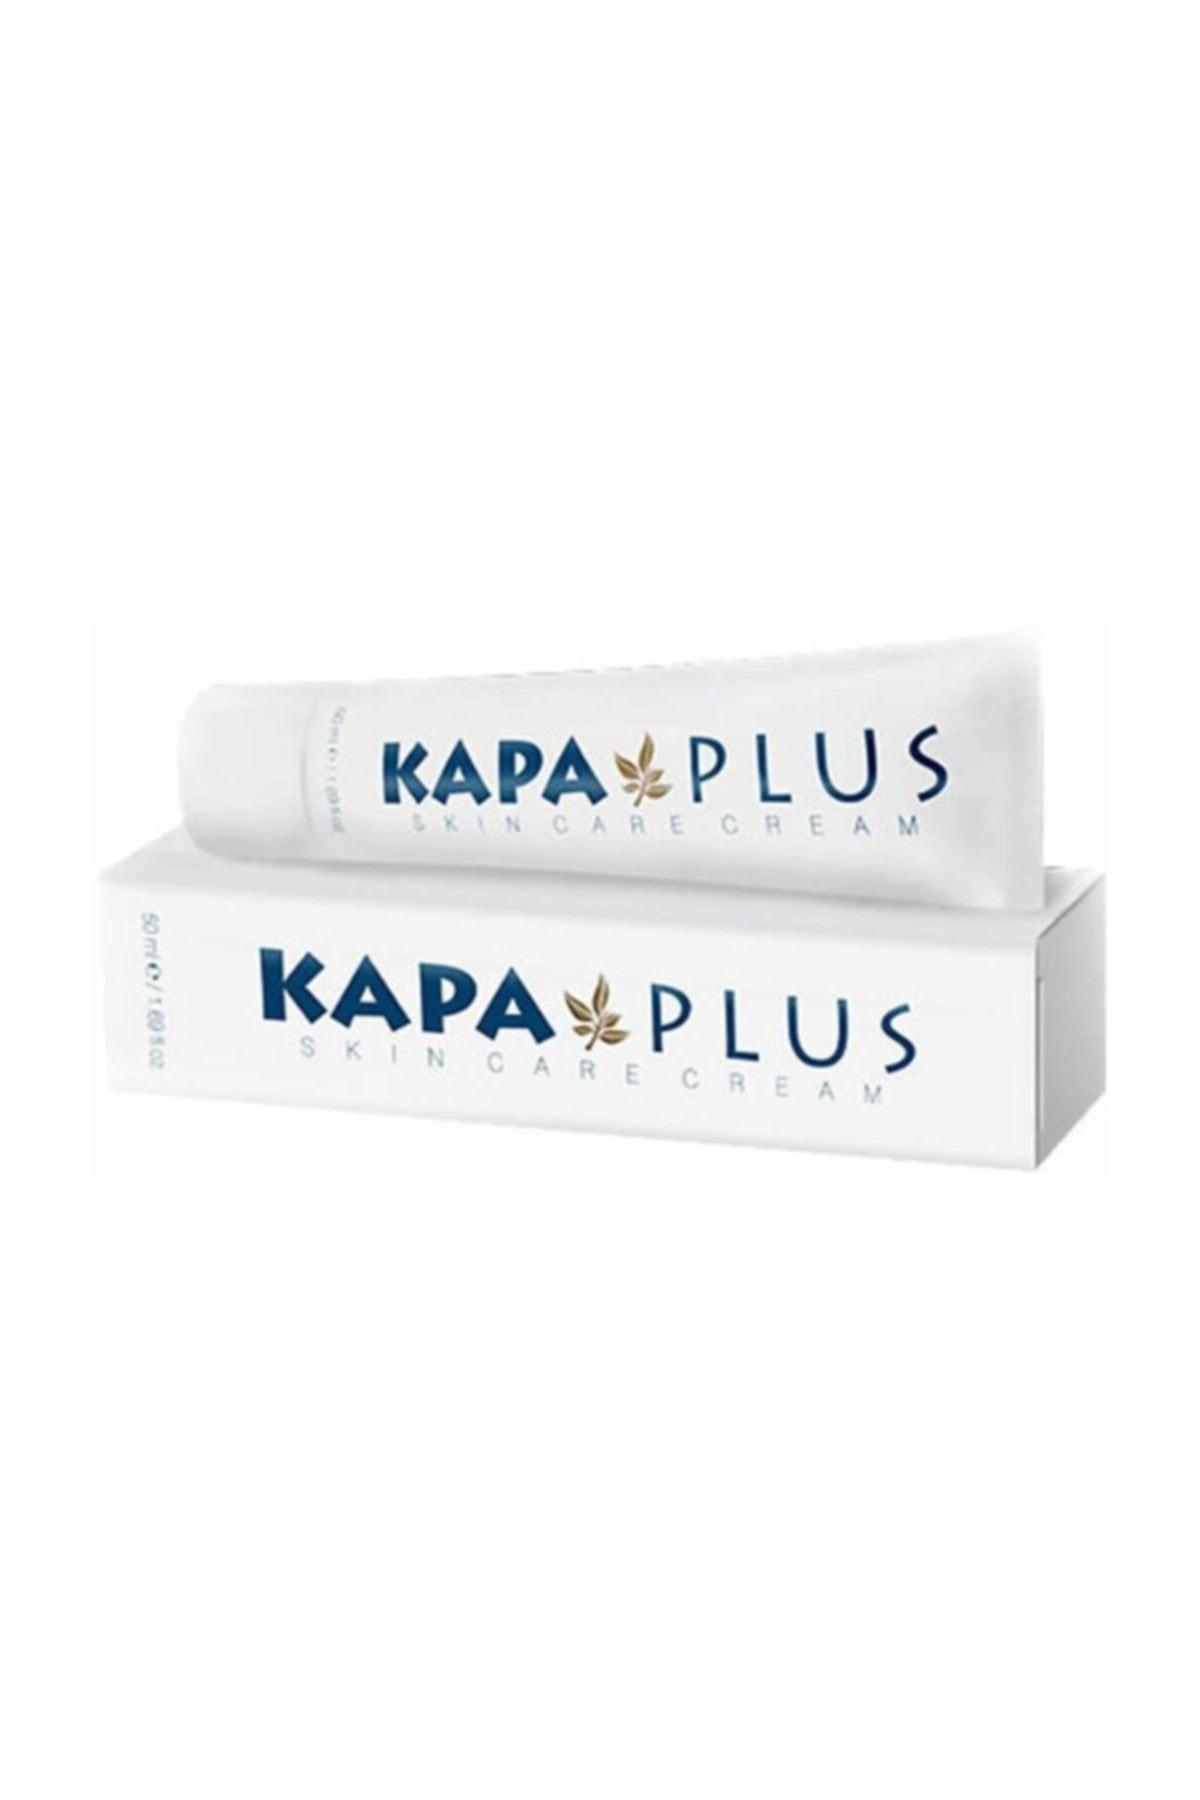 Kapa Plus Skın Care Cream kapa plus 8681422370180 1